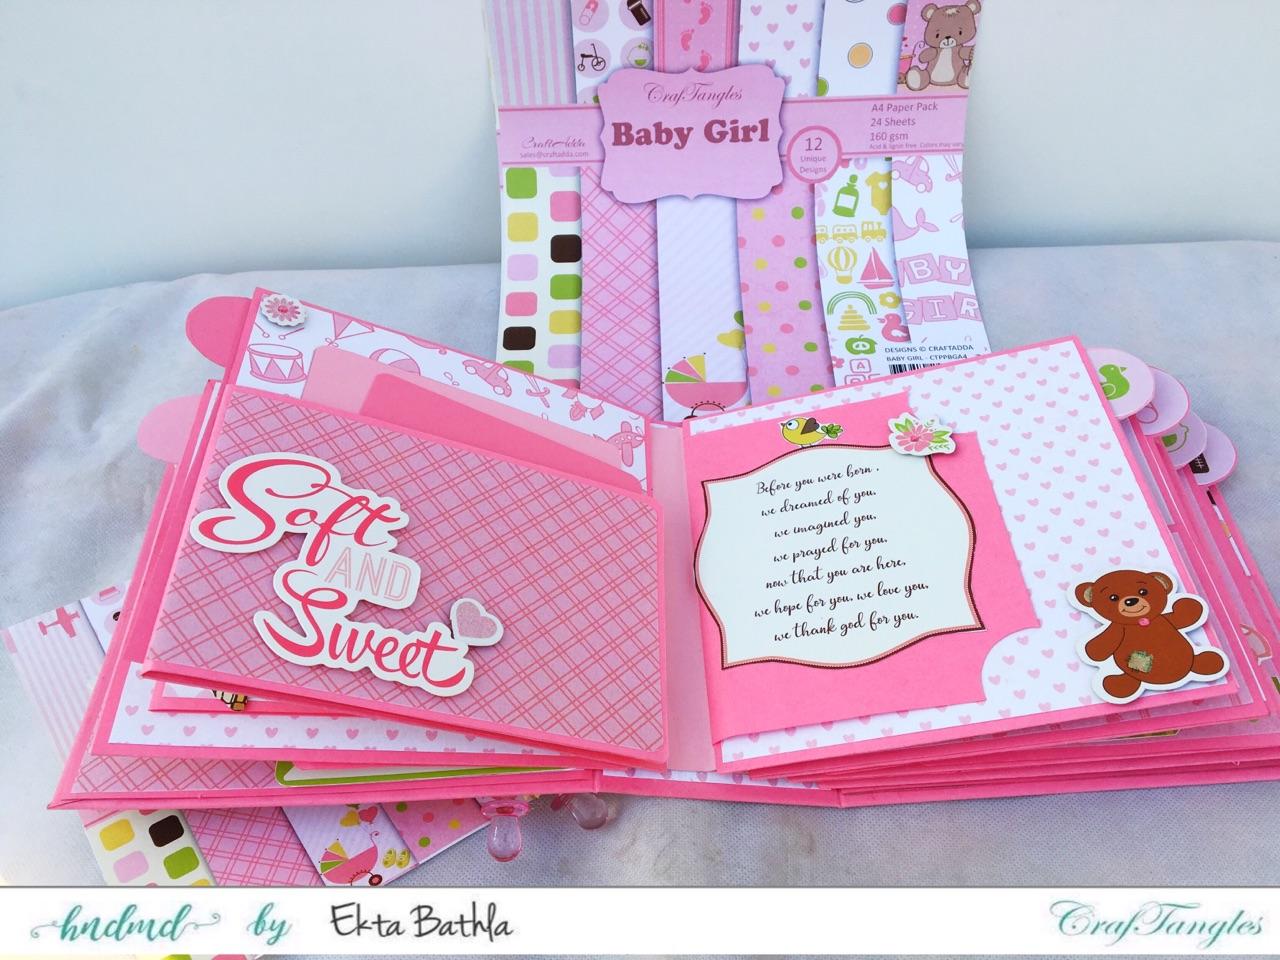 Baby Girl mini album showcasing Baby Girl Elements Pack by CrafTangles 4